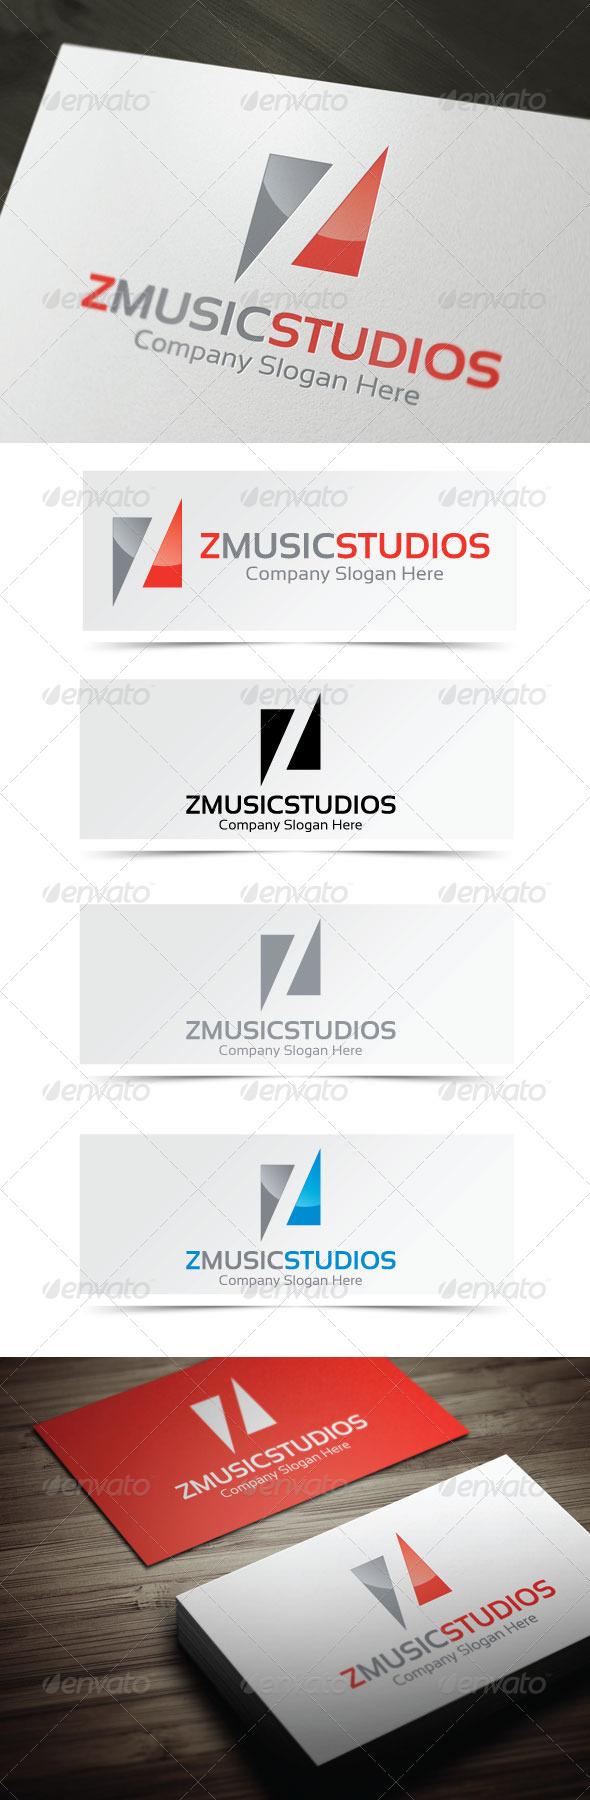 Z Music Studios Logo - Letters Logo Templates